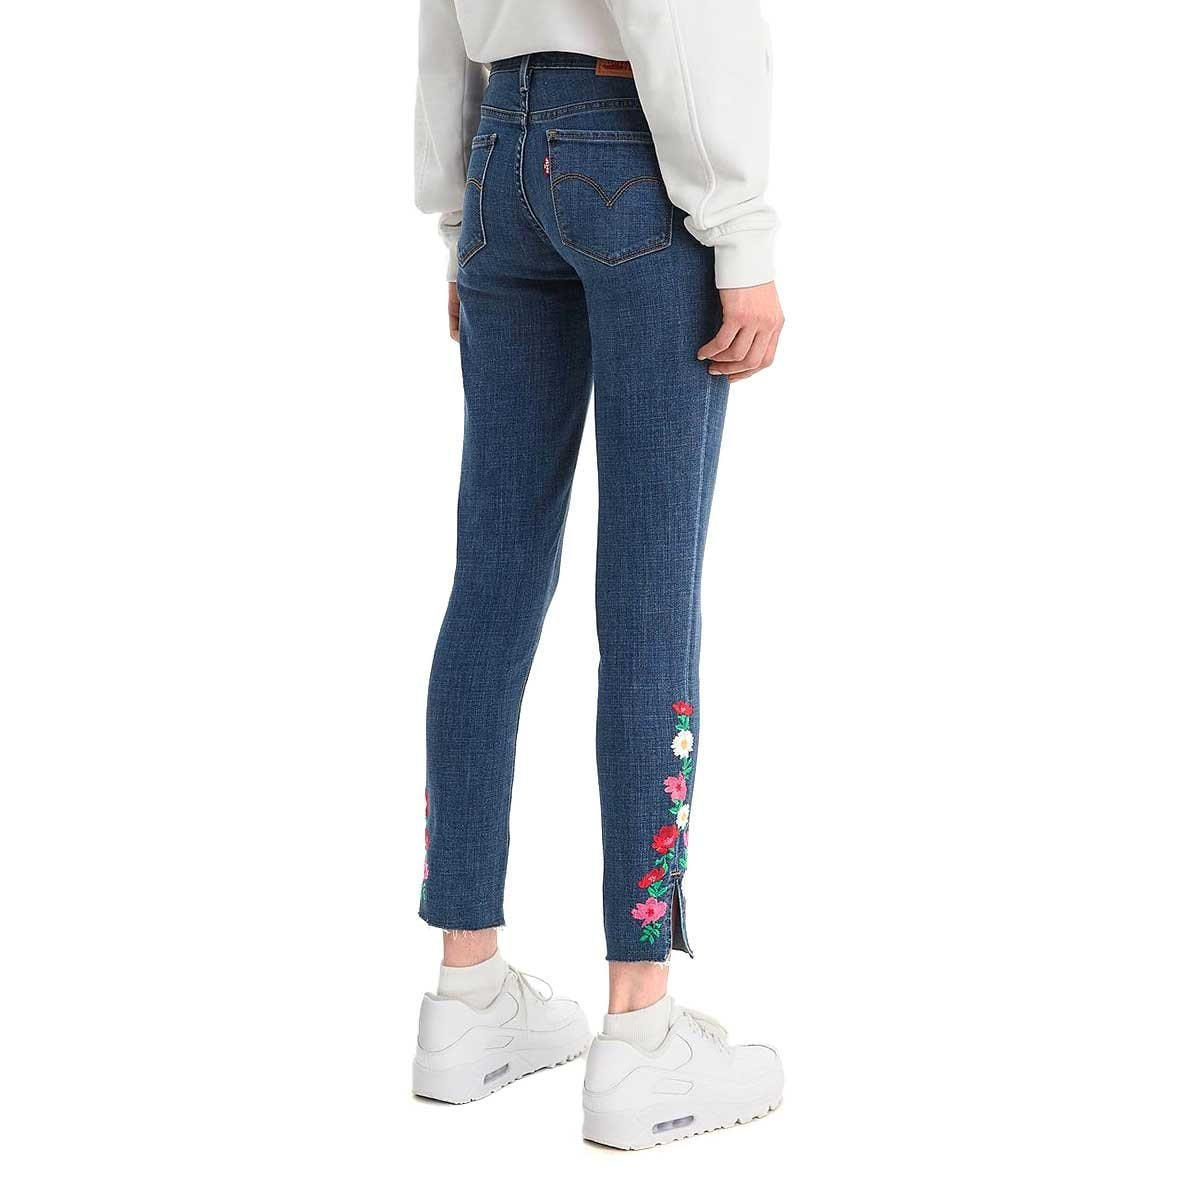 Jeans Ankle Cintura Media Levi's